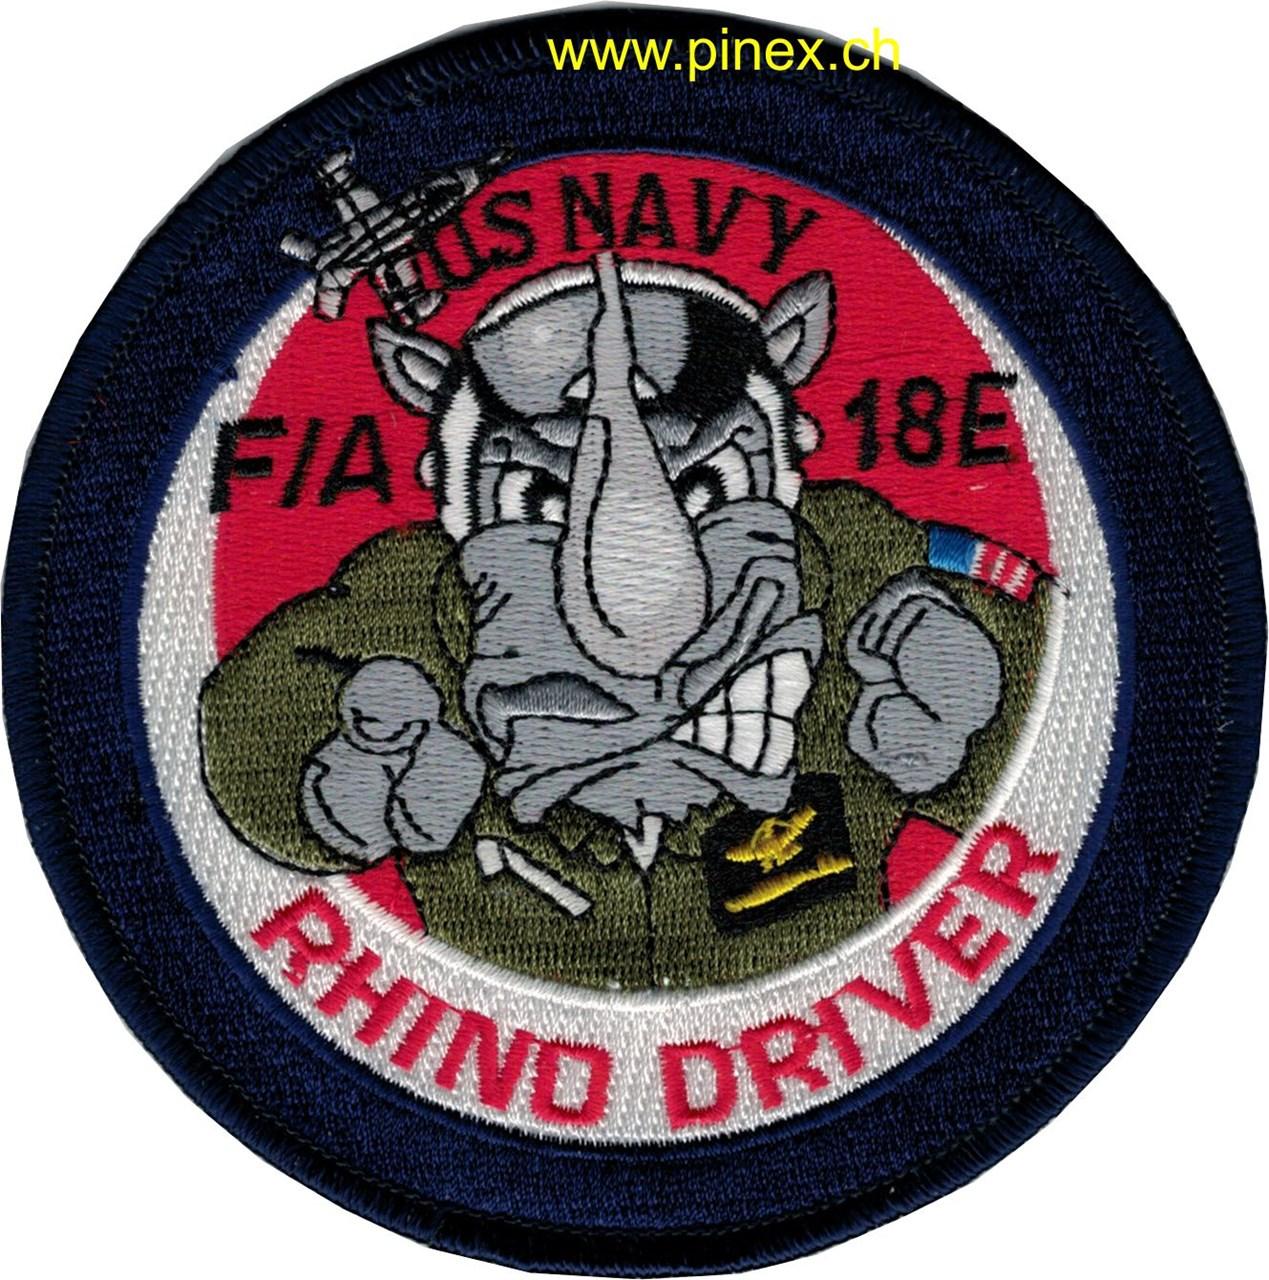 Us Navy F 18 Hornet Systemabzeichen 110mm Pinex Badges